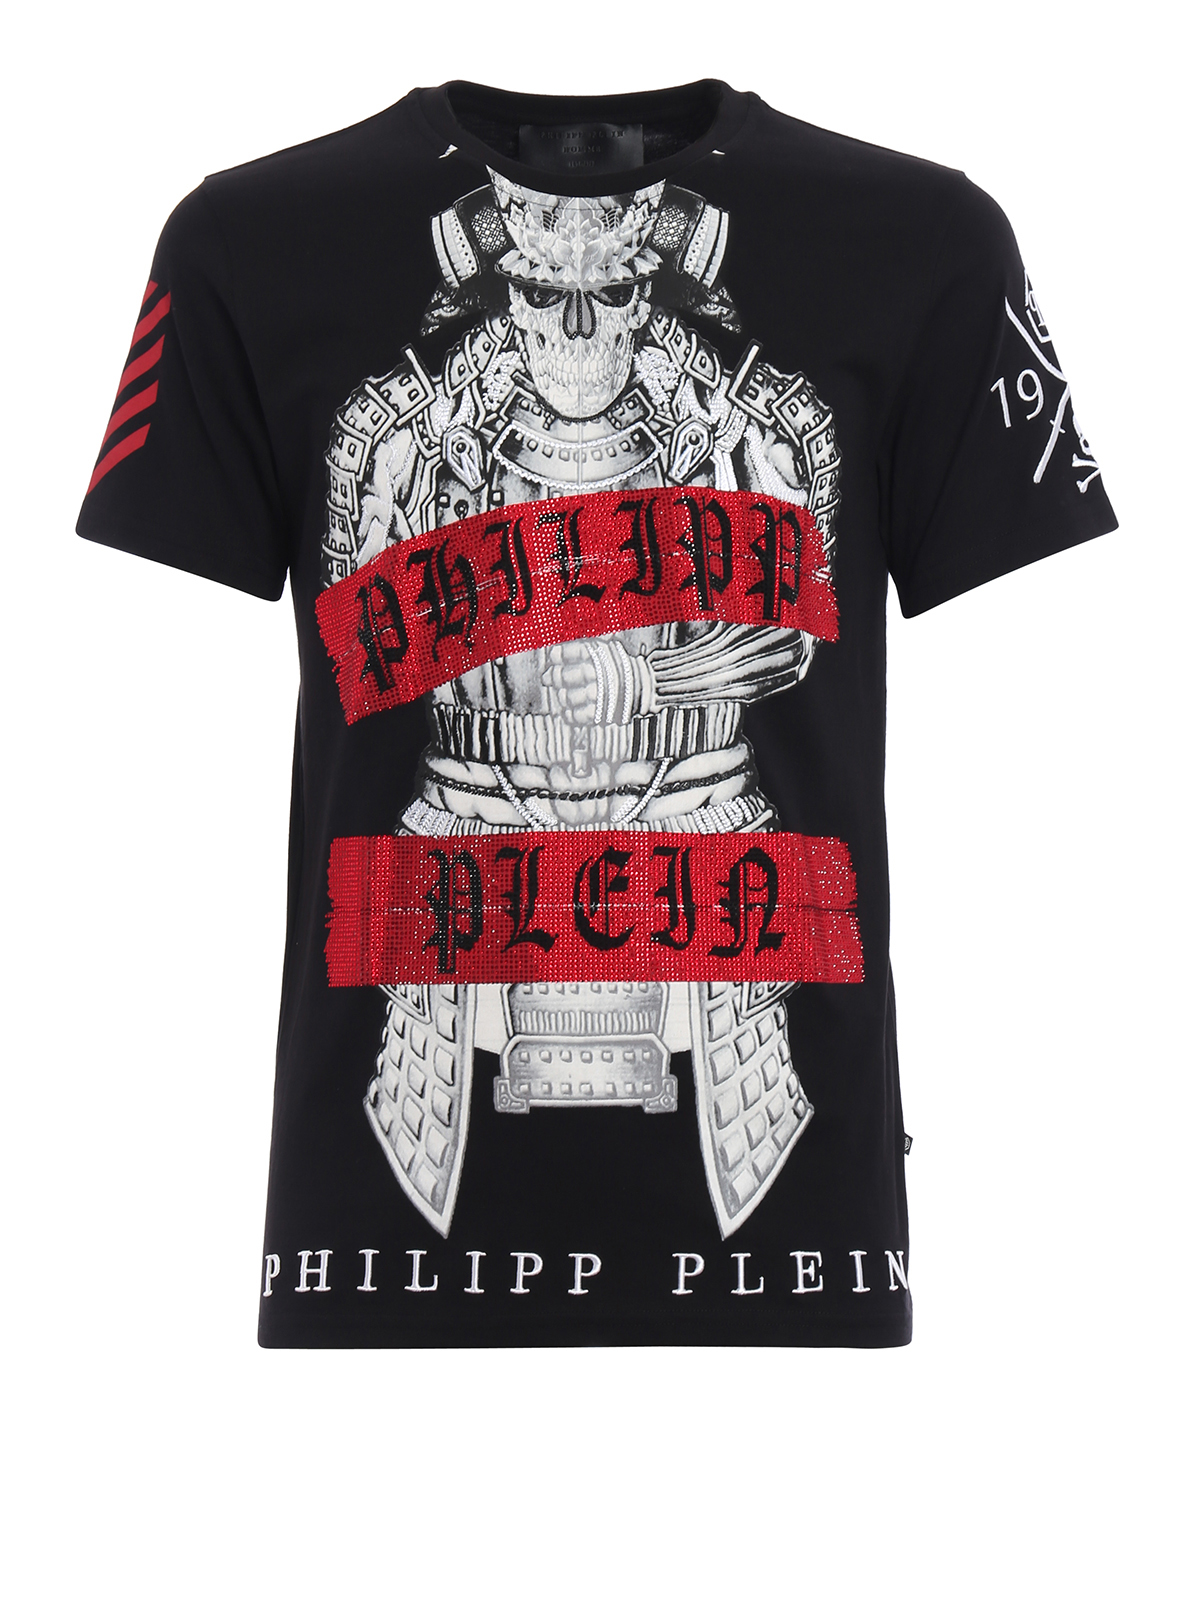 53787fb5c2 Philipp Plein - Kami skeleton samurai Tee - t-shirts - MTK0902 ...